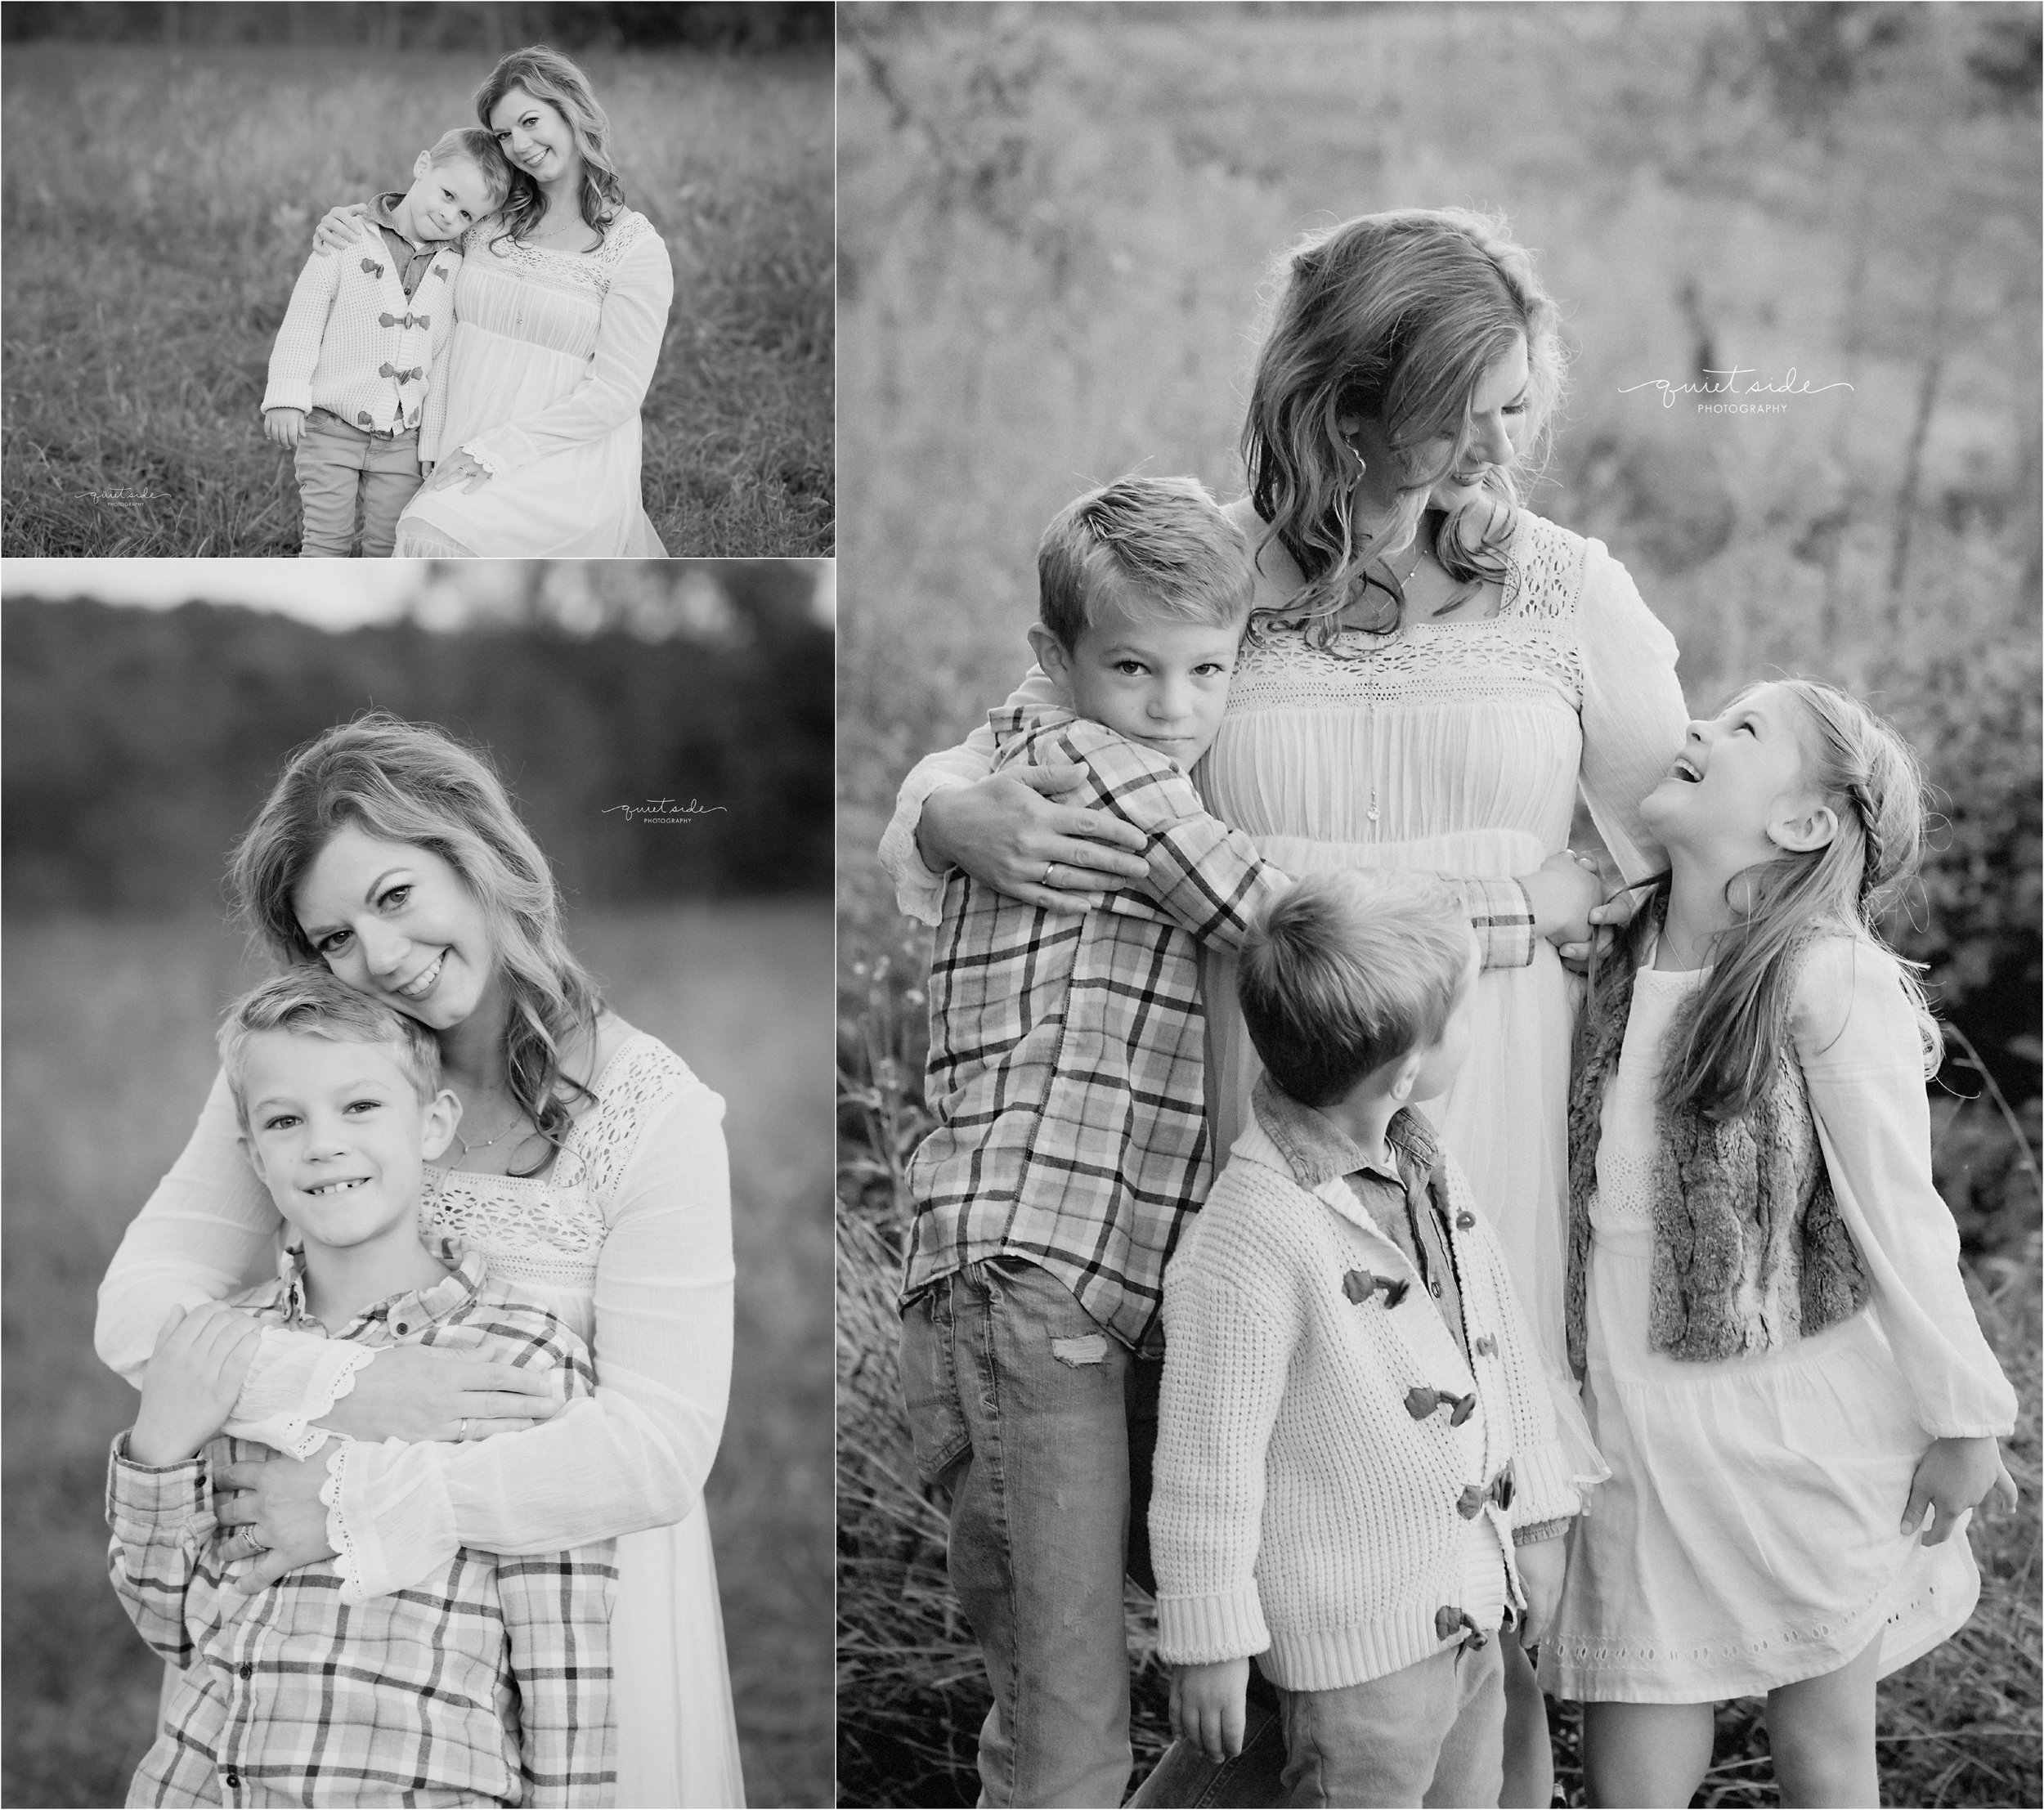 QuietSidePhotography-Purcellville, VA- Family-Photographer-Motherhood-Familyof5-SilverbrookFarm-GoldenHour-Sunset-Family-Loudoun County-Virginia.jpg